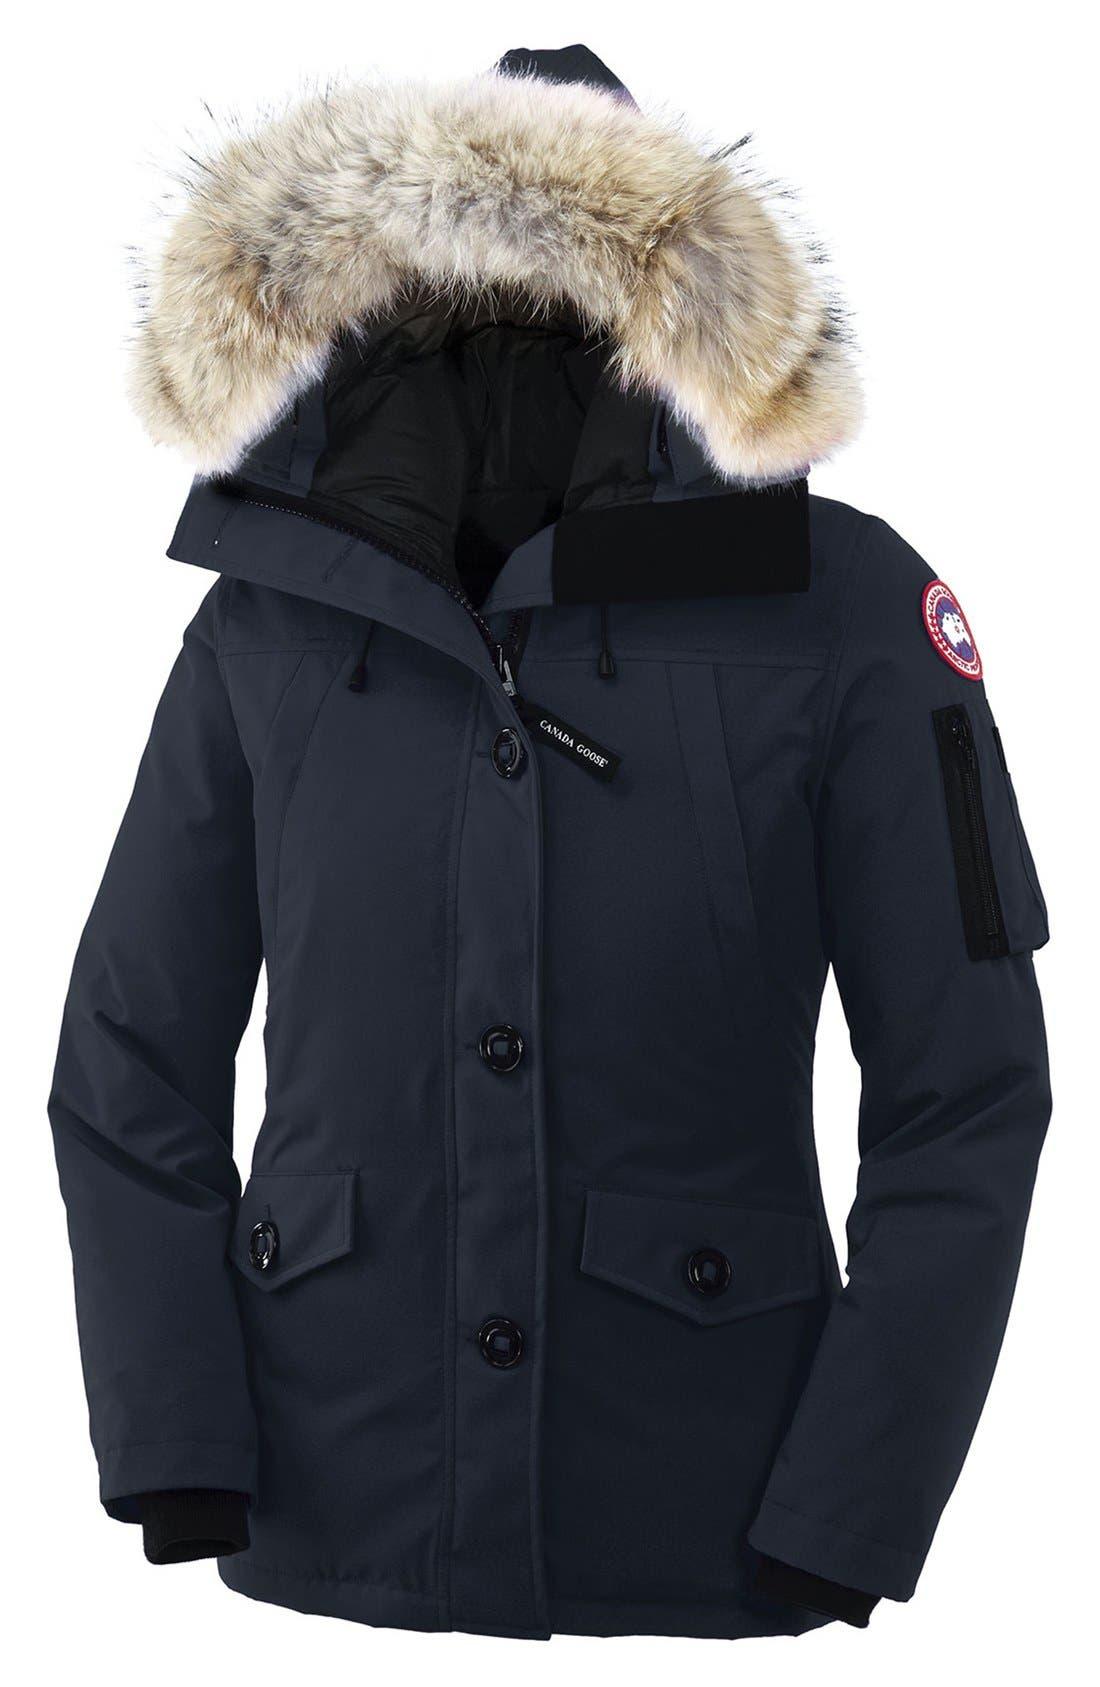 Main Image - Canada Goose Montebello Slim Fit Down Parka with Genuine Coyote Fur Trim